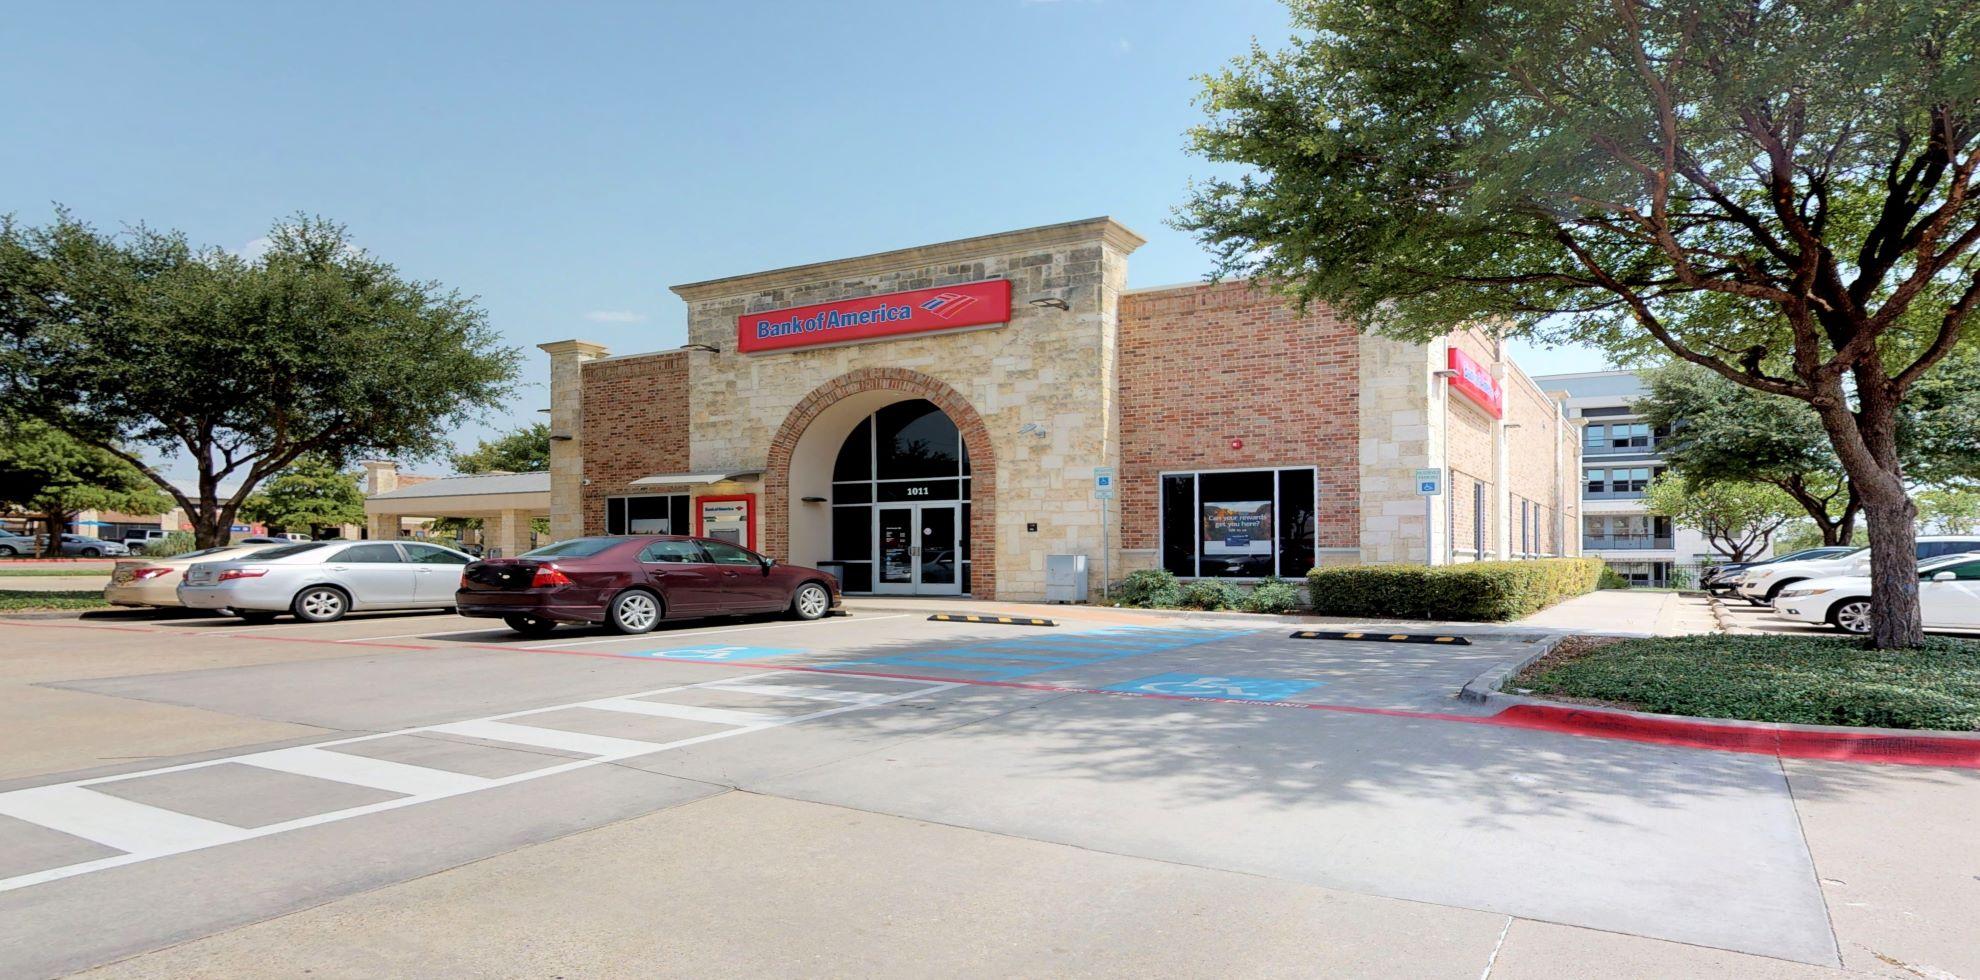 Bank of America financial center with drive-thru ATM | 1011 W McDermott Dr, Allen, TX 75013